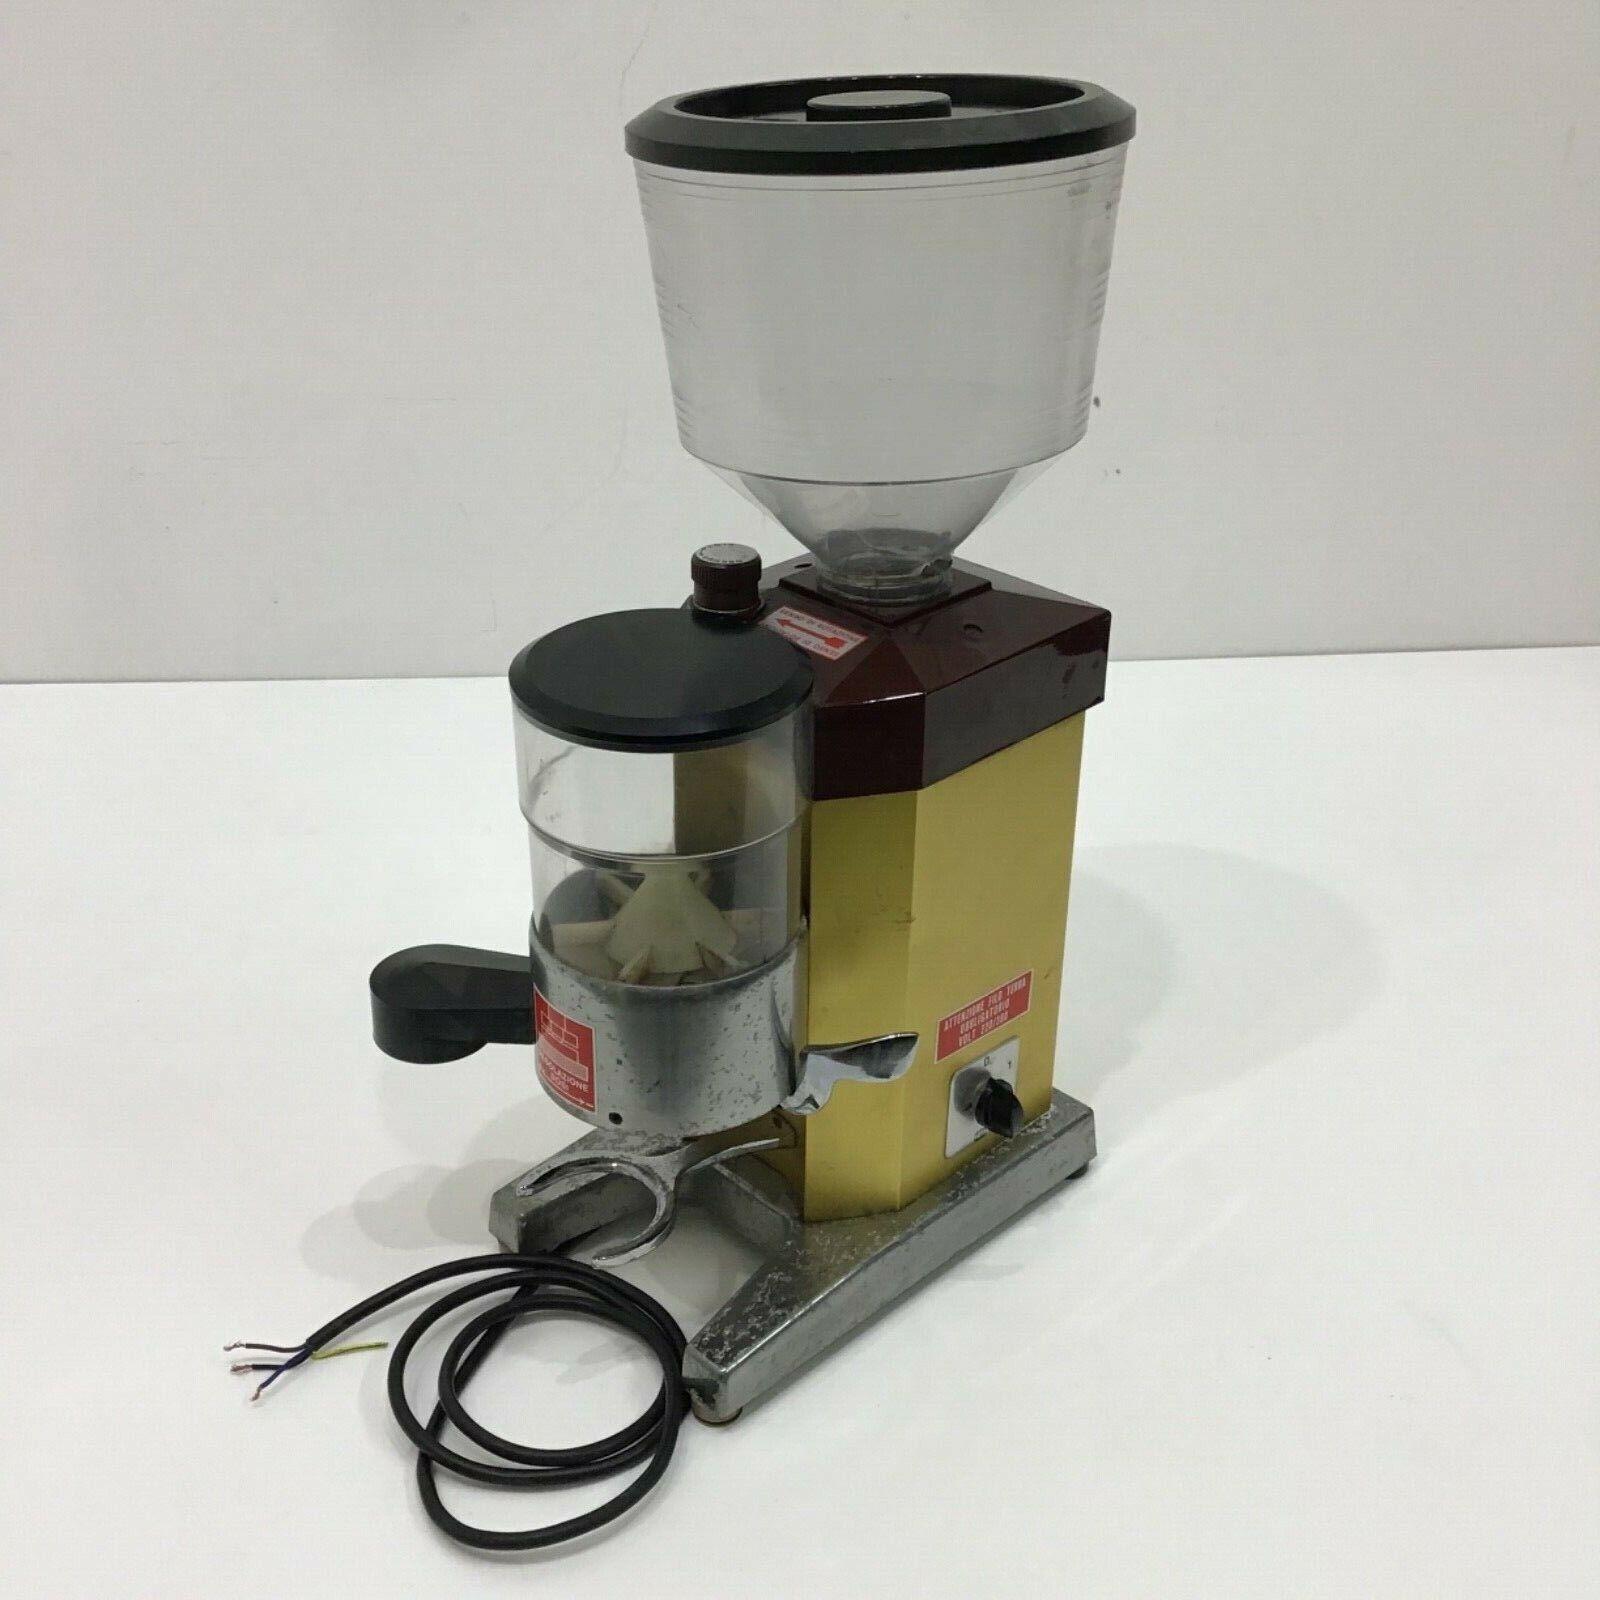 MACINA CAFFE DOSATORE PROFESSIONALE EUREKA 220-380 VOLT TOP DOSER COFFEE MILL